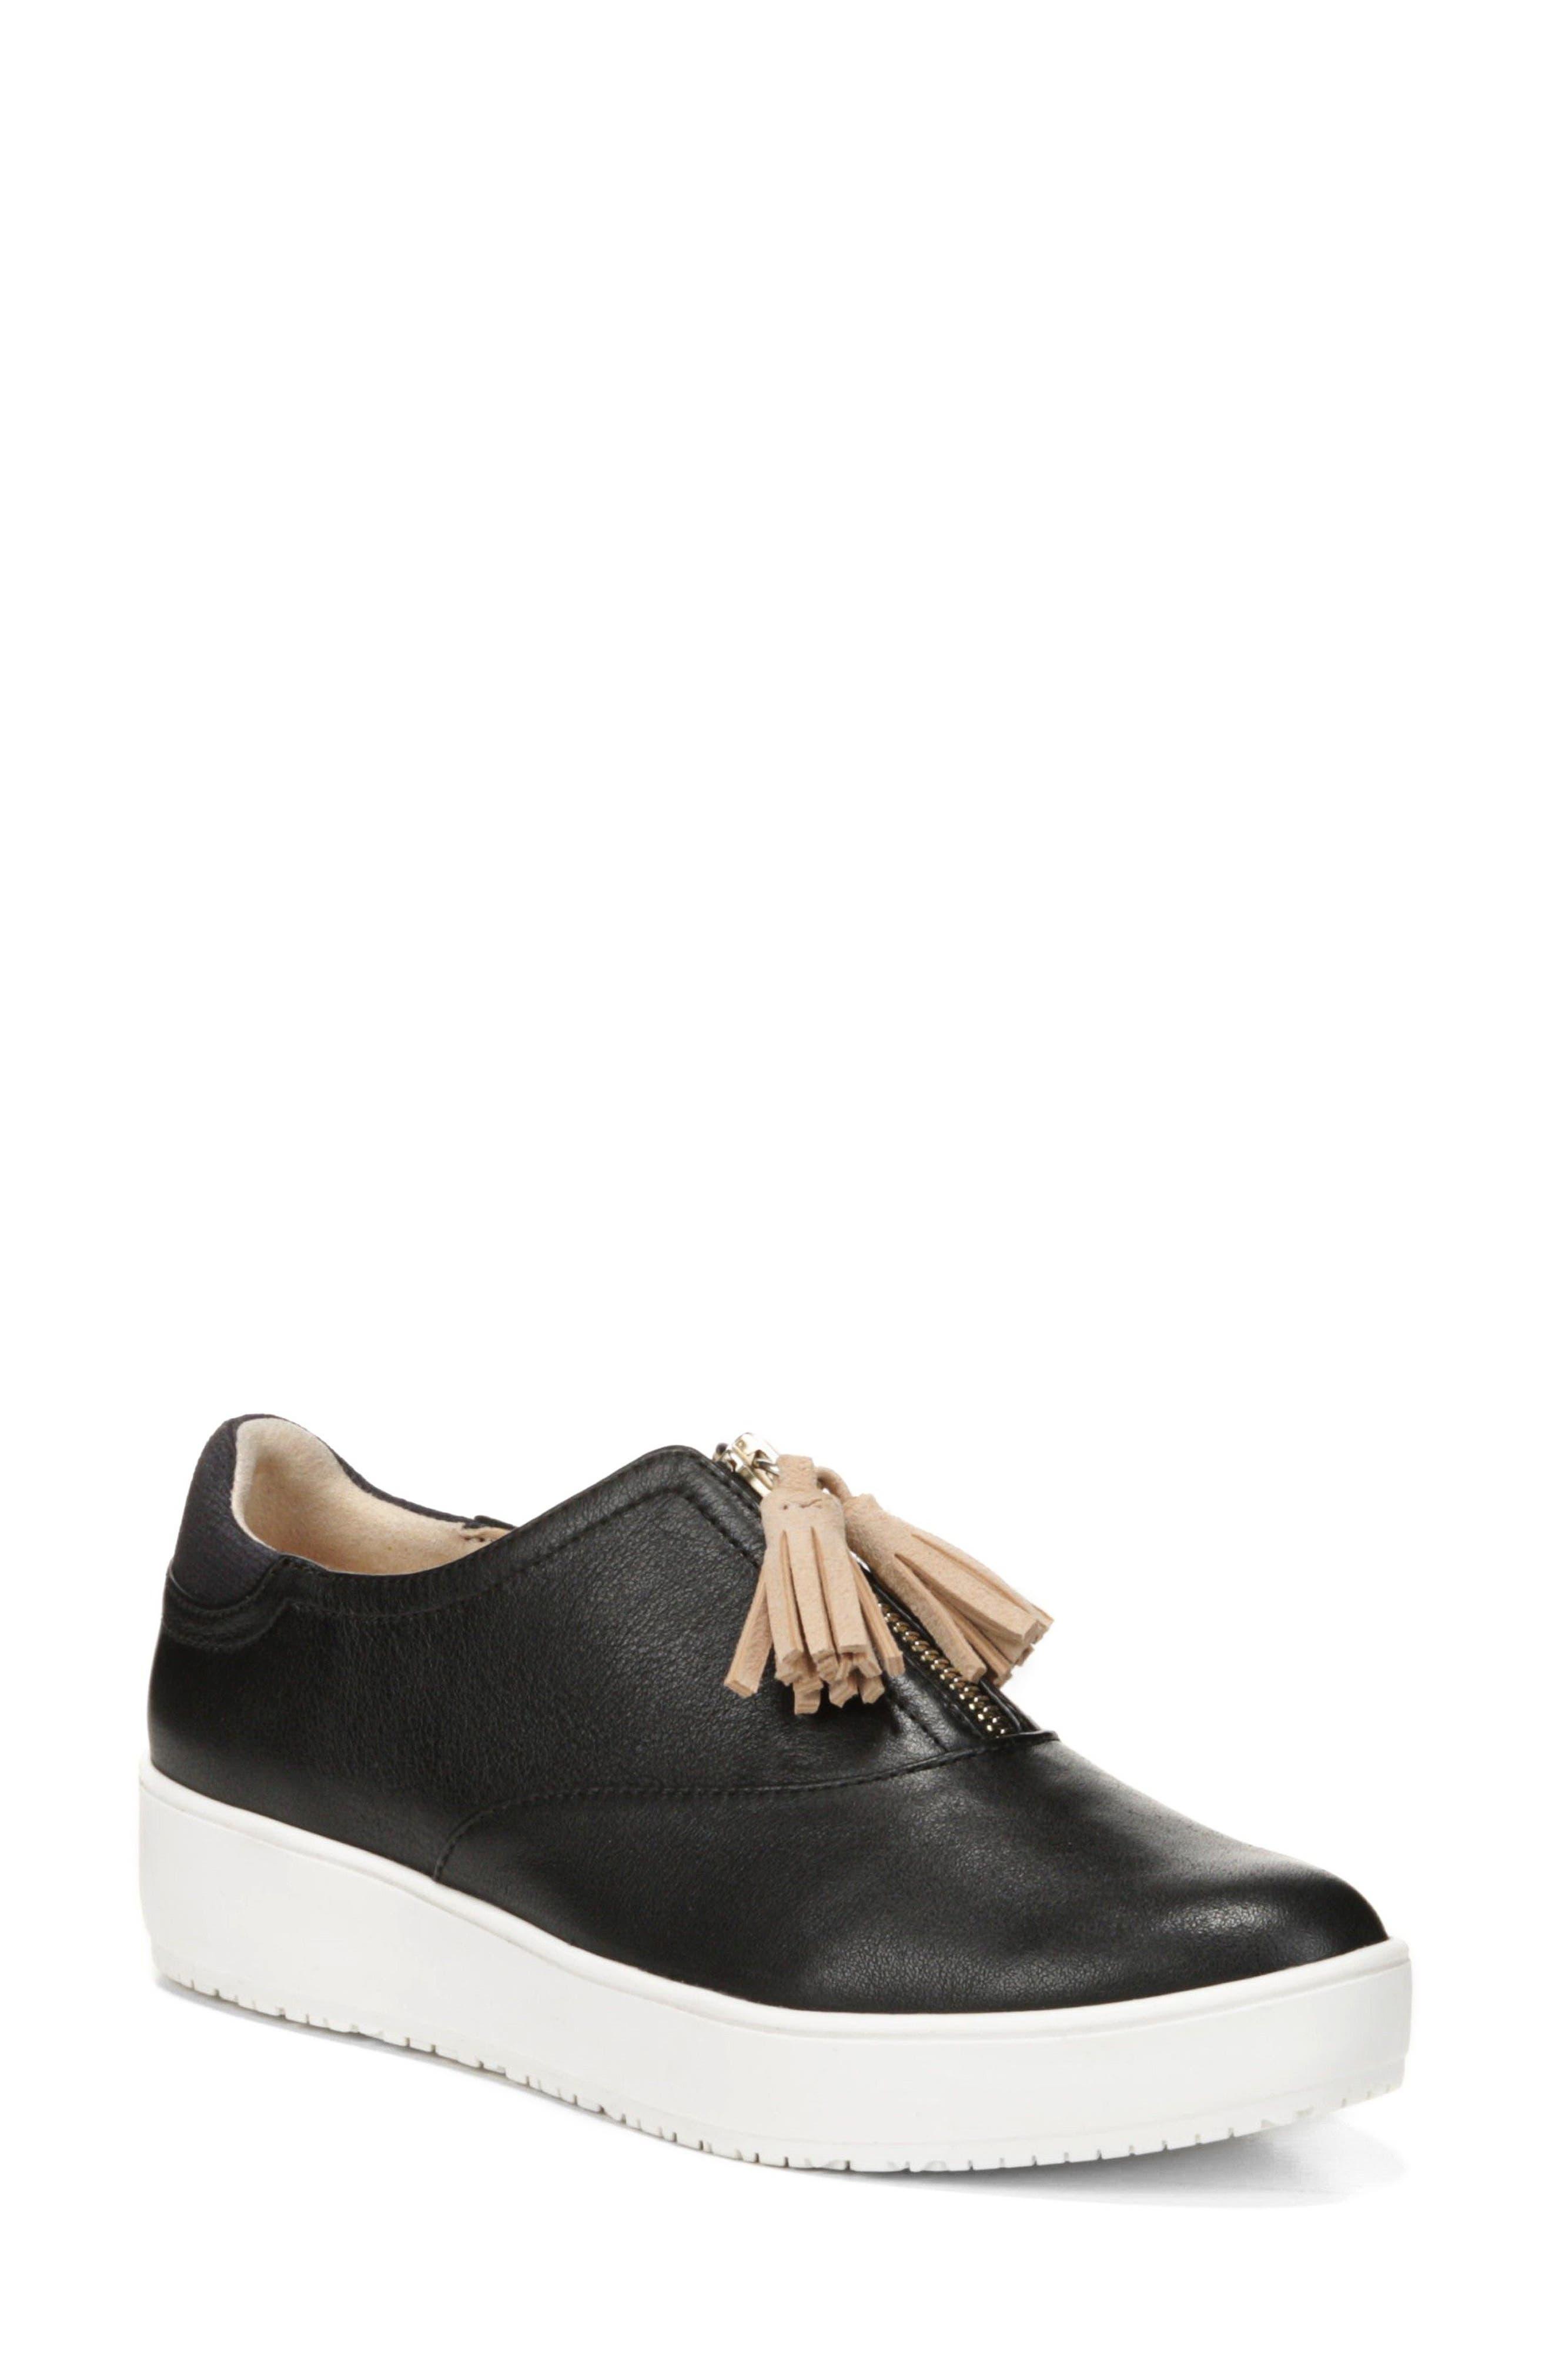 Blakely Tassel Zip Sneaker,                             Main thumbnail 1, color,                             001